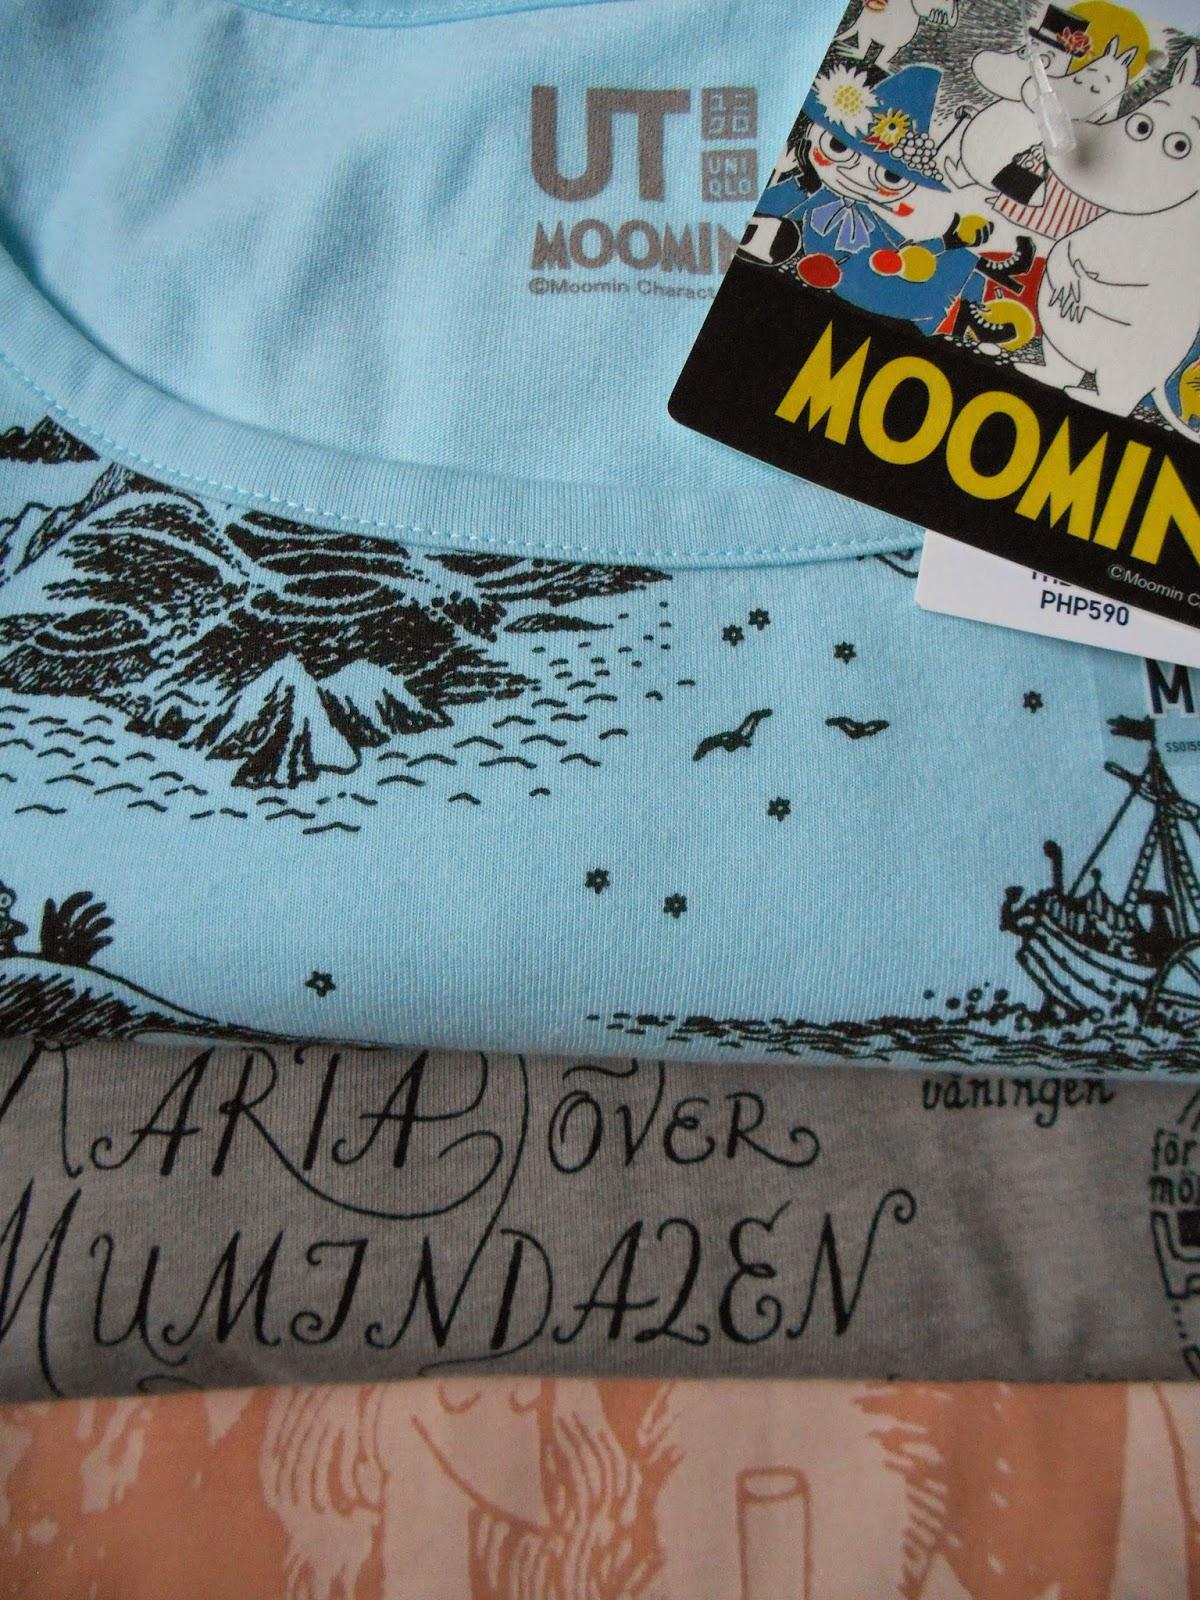 UNIQLO UT Moomin Women's Collection